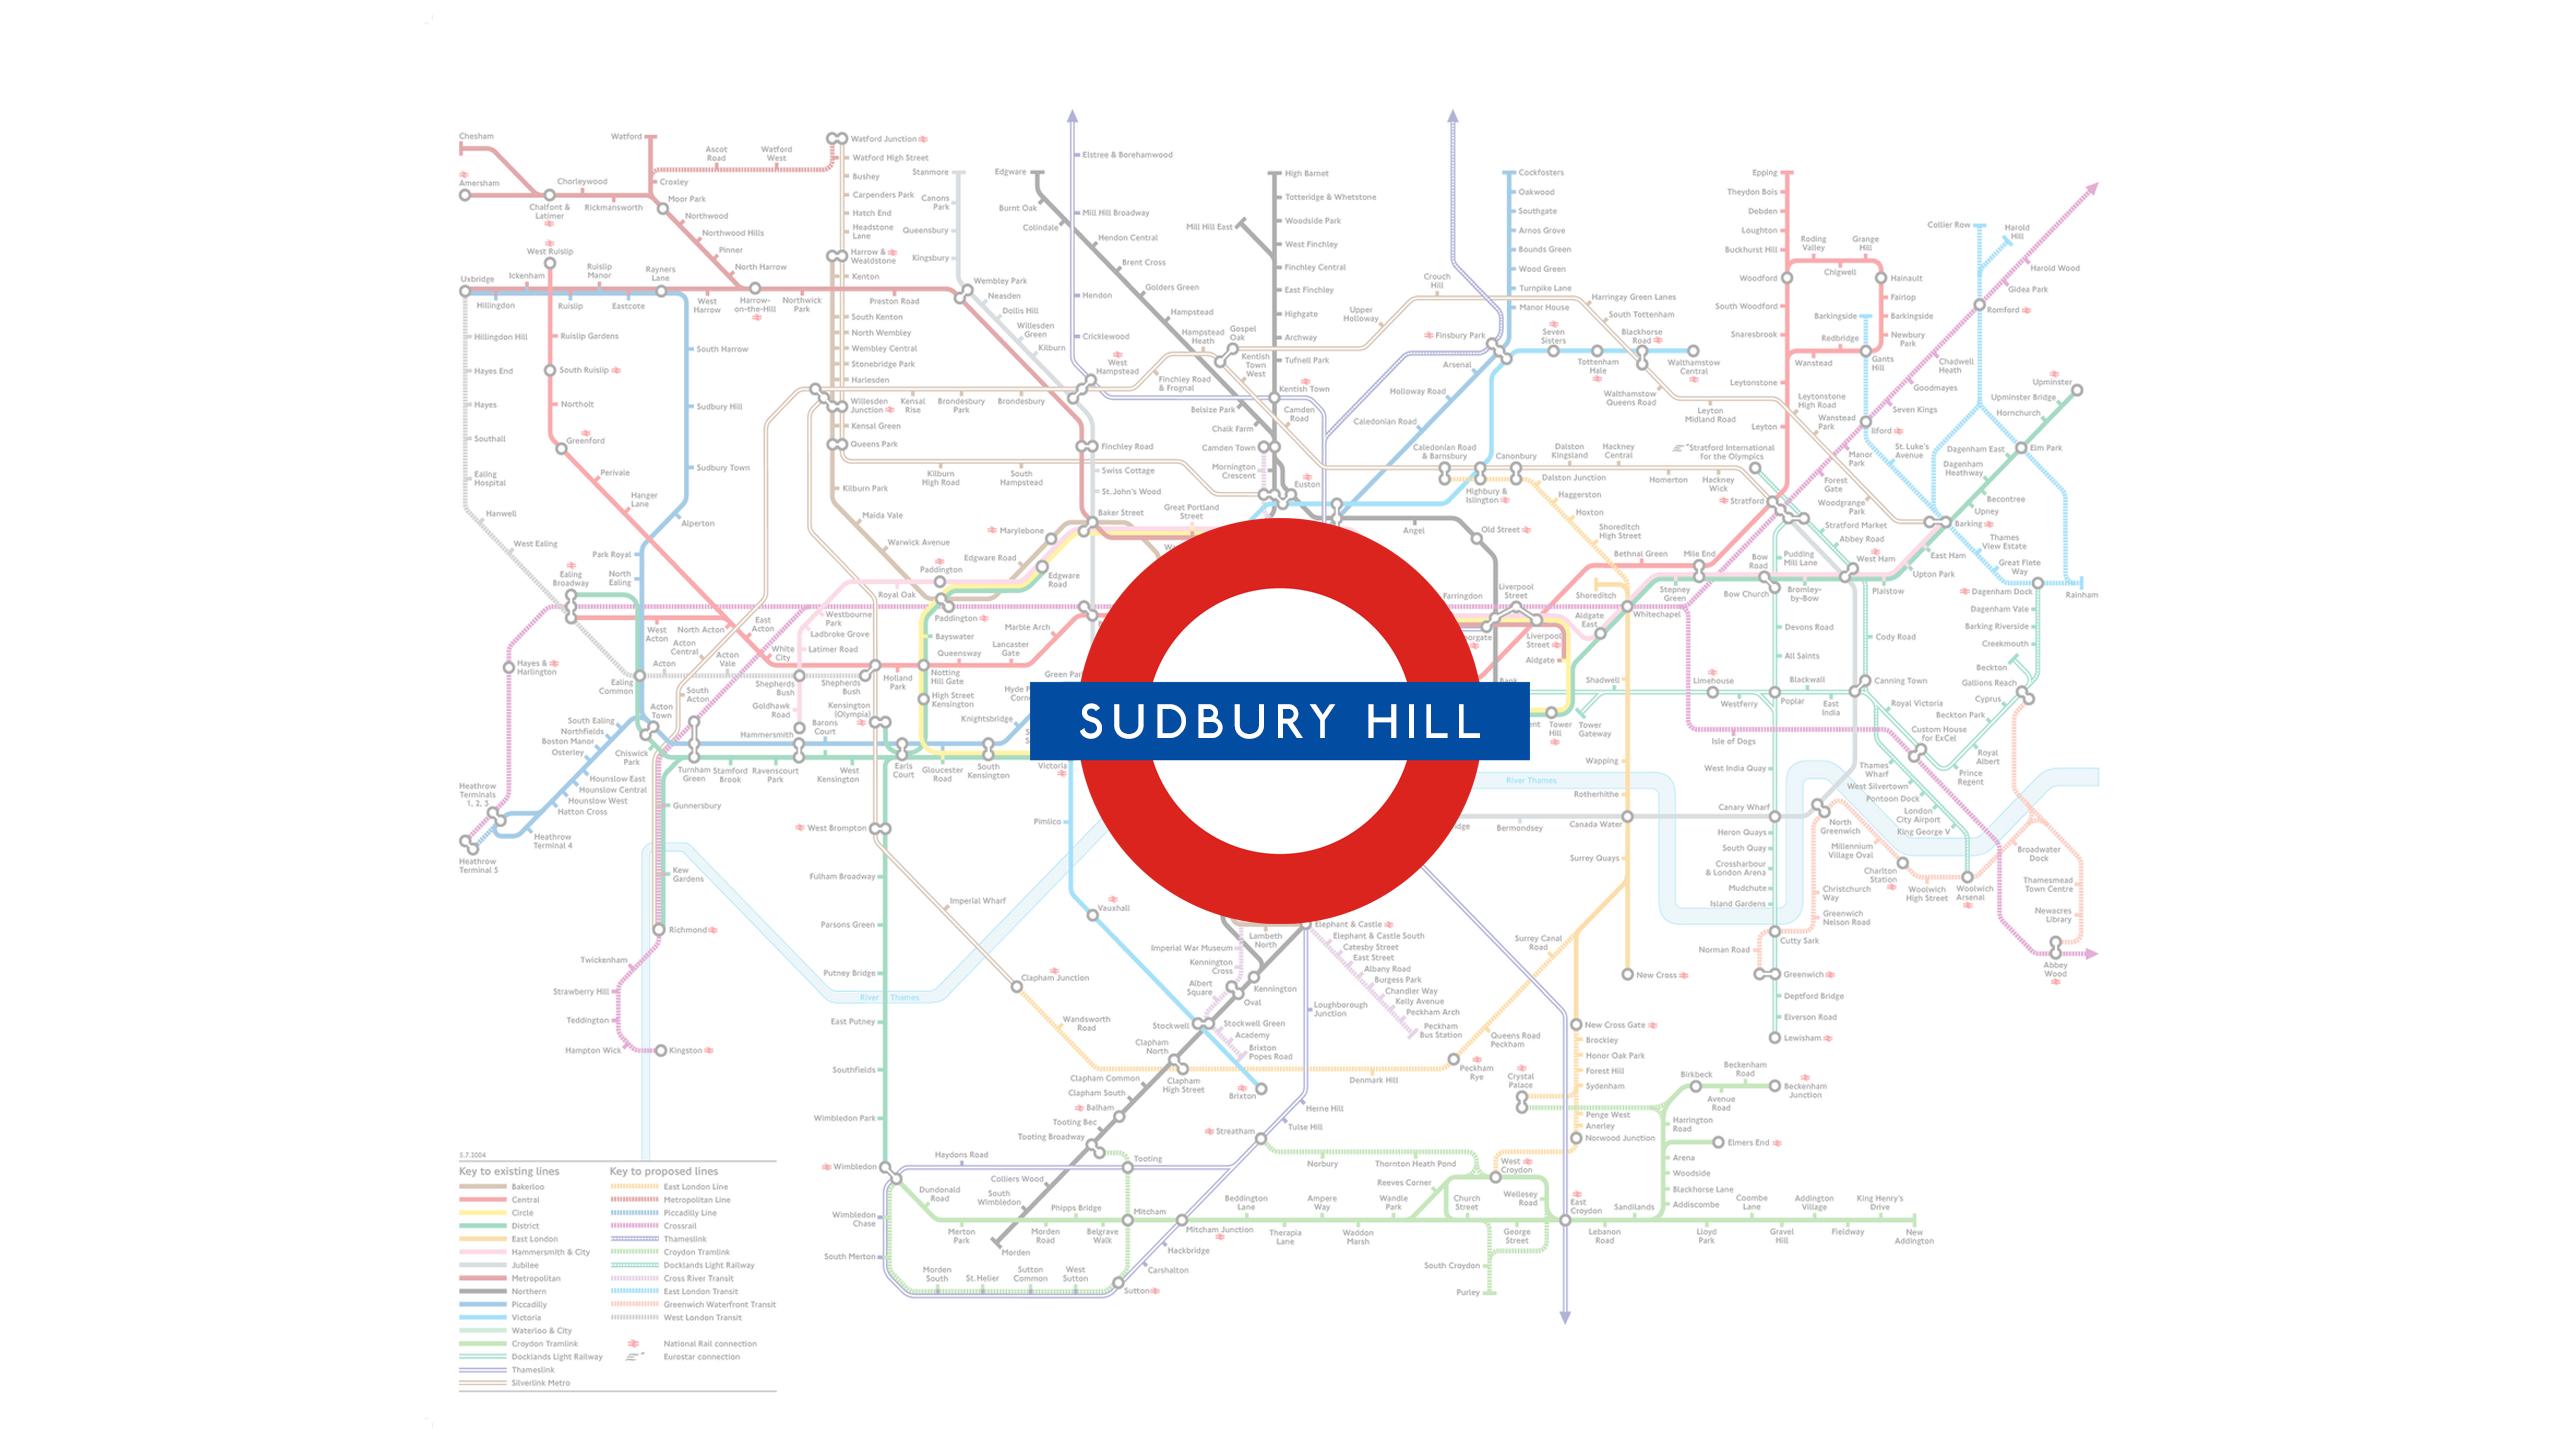 Sudbury Hill (Map)